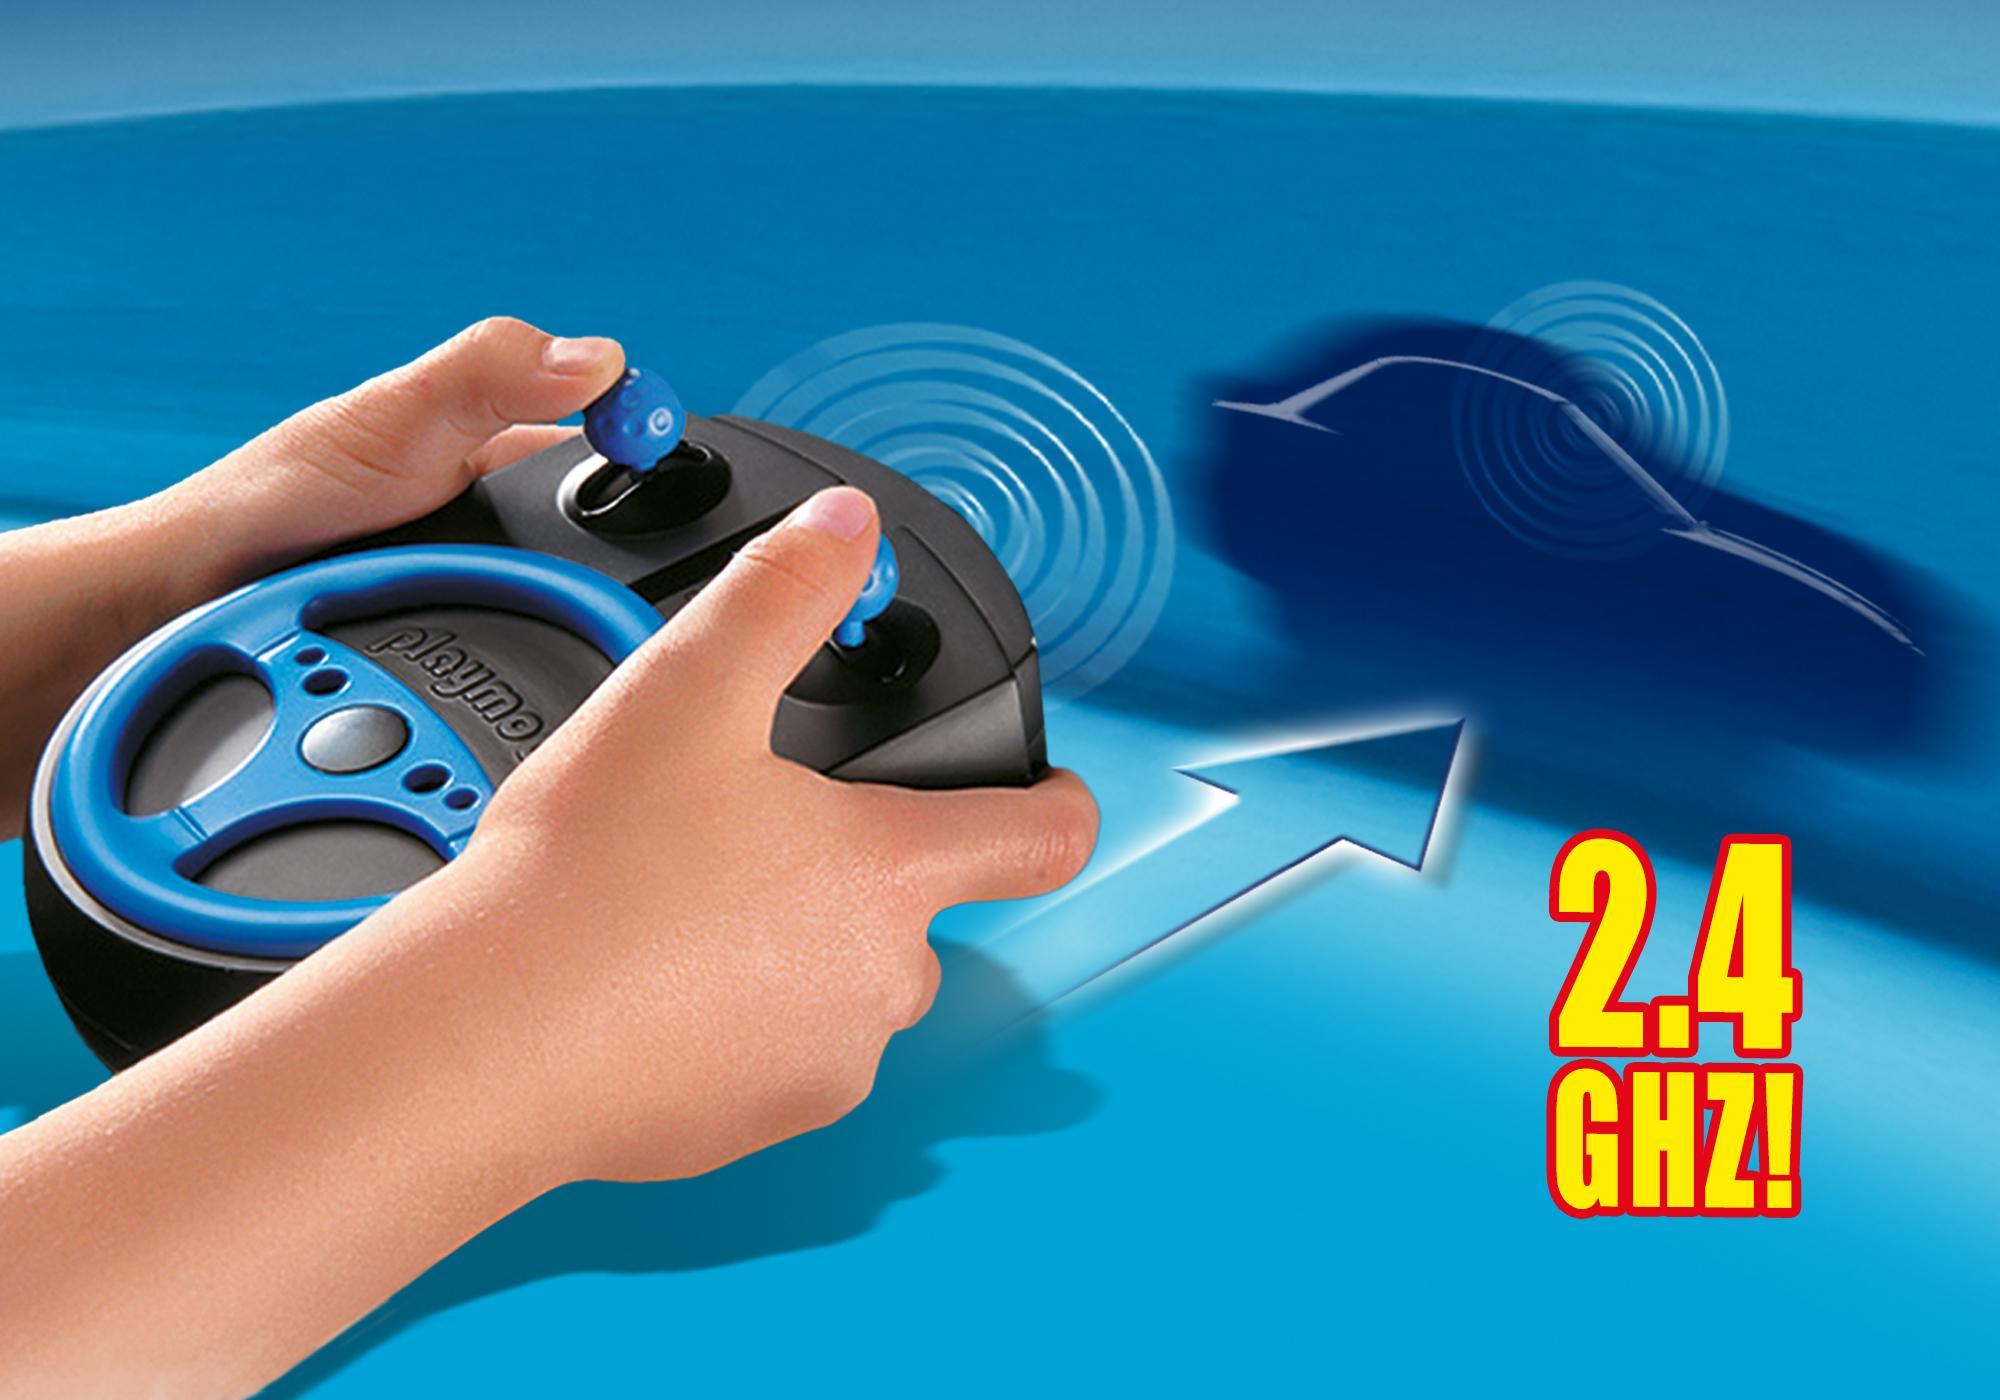 http://media.playmobil.com/i/playmobil/6914_product_extra2/RC-Modul-Set 2,4 GHz